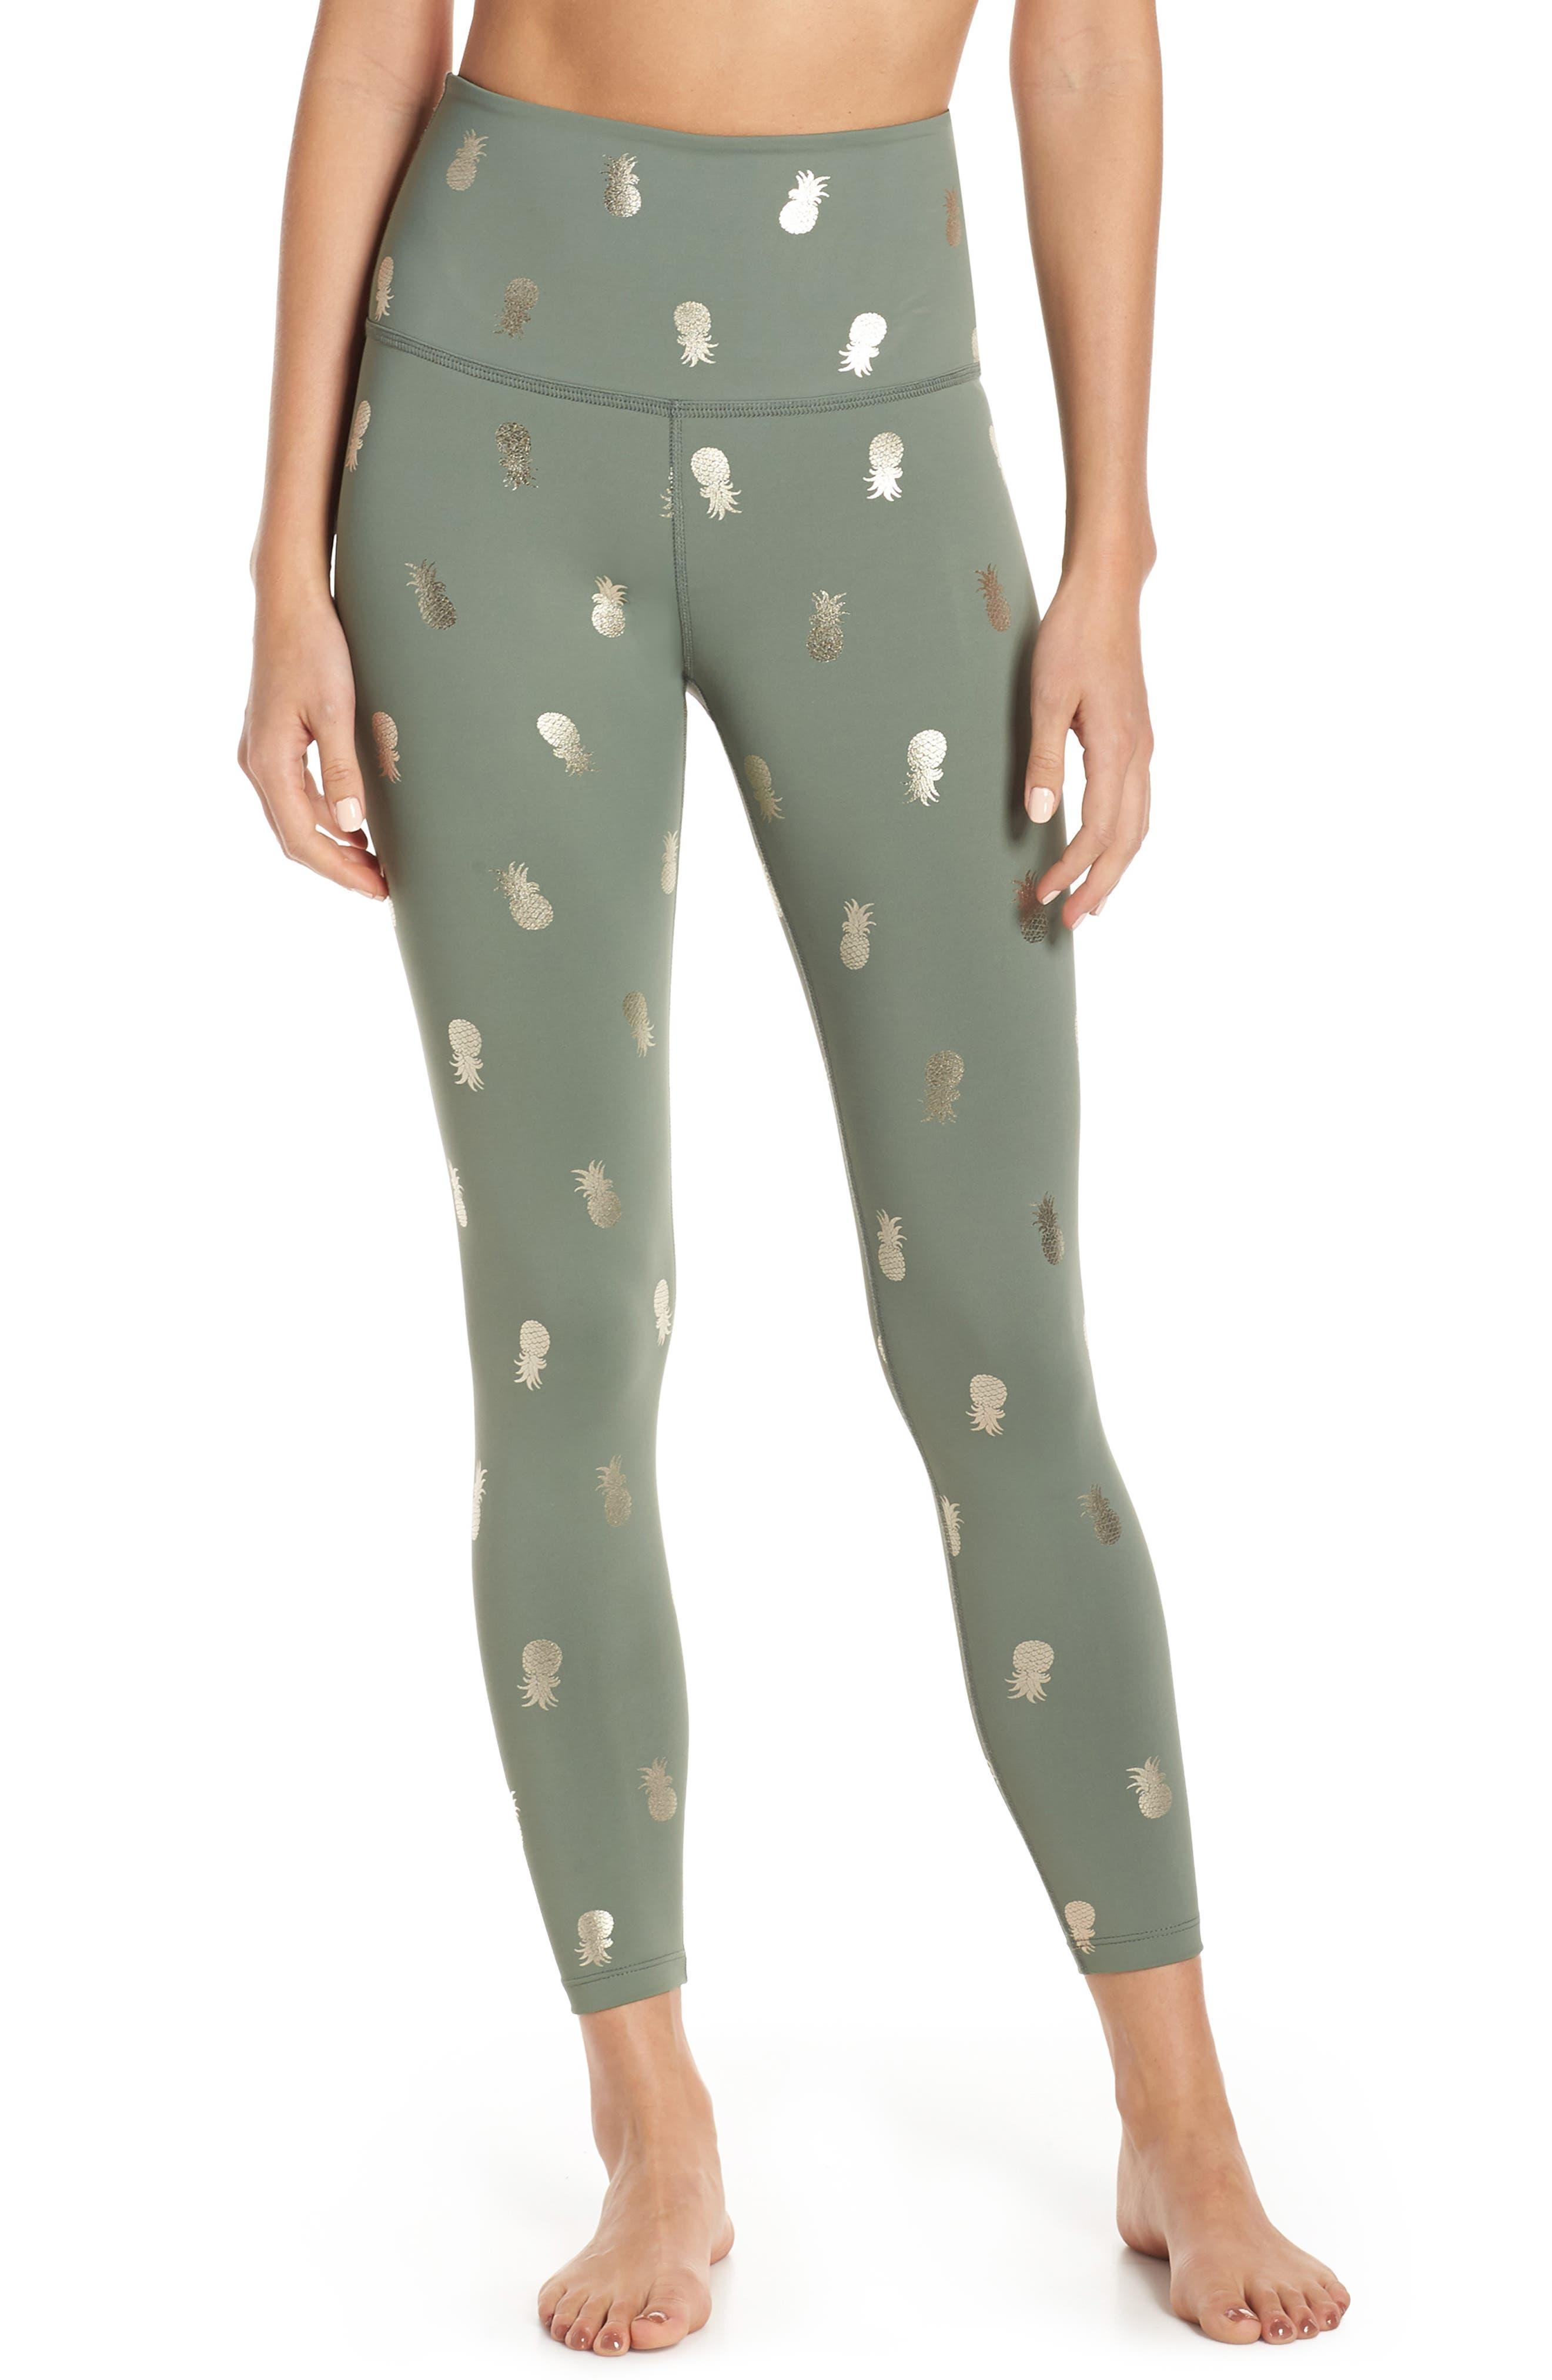 BEYOND YOGA Pineapple Midi Leggings, Main, color, ALOHA GREEN PINEAPPLES